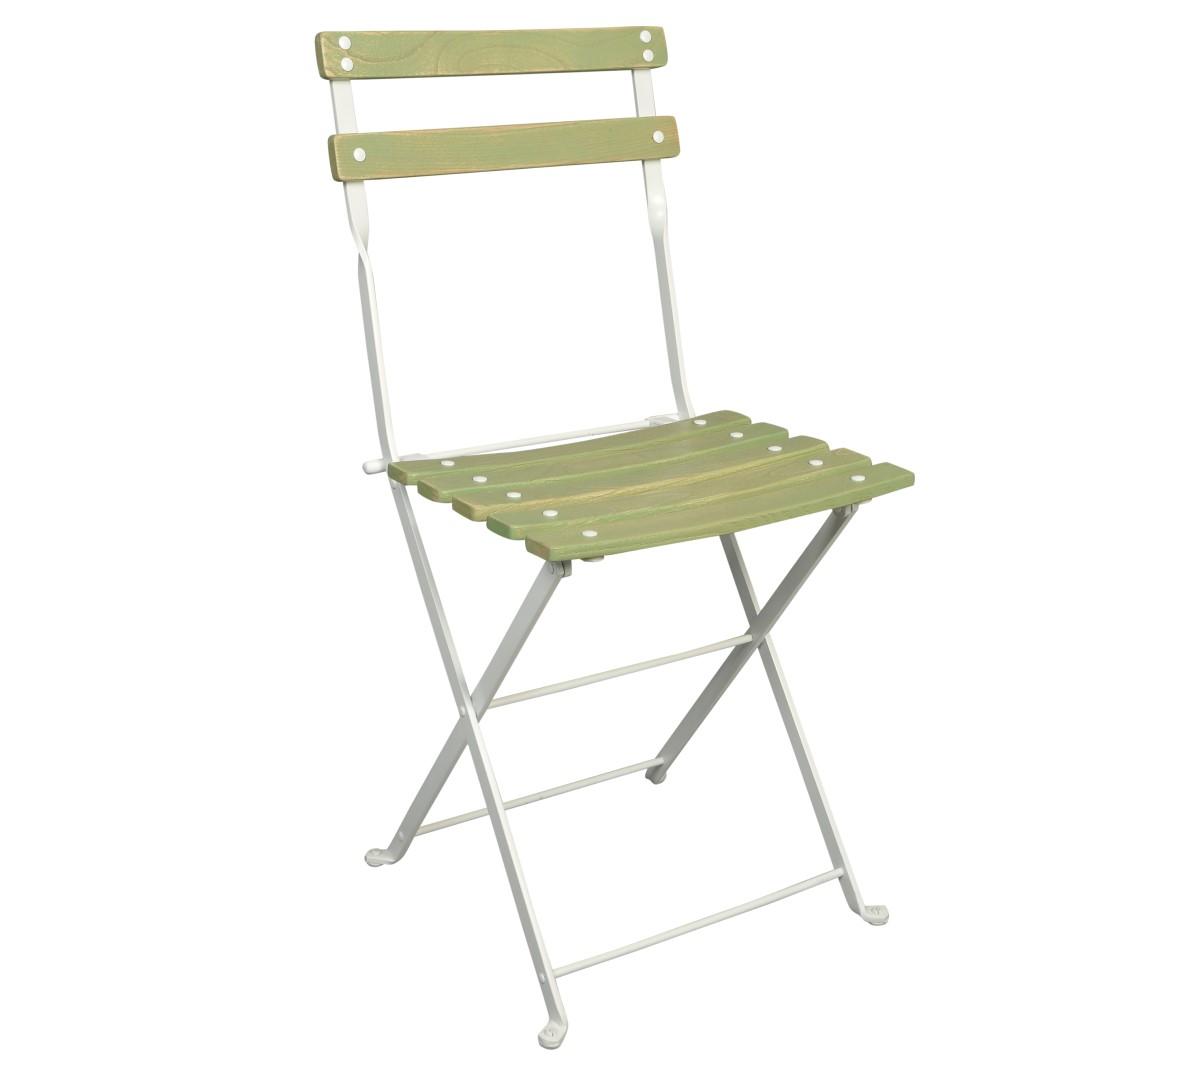 Dijon Chair - Chestnut Slats - Aged Wood Finish - Green